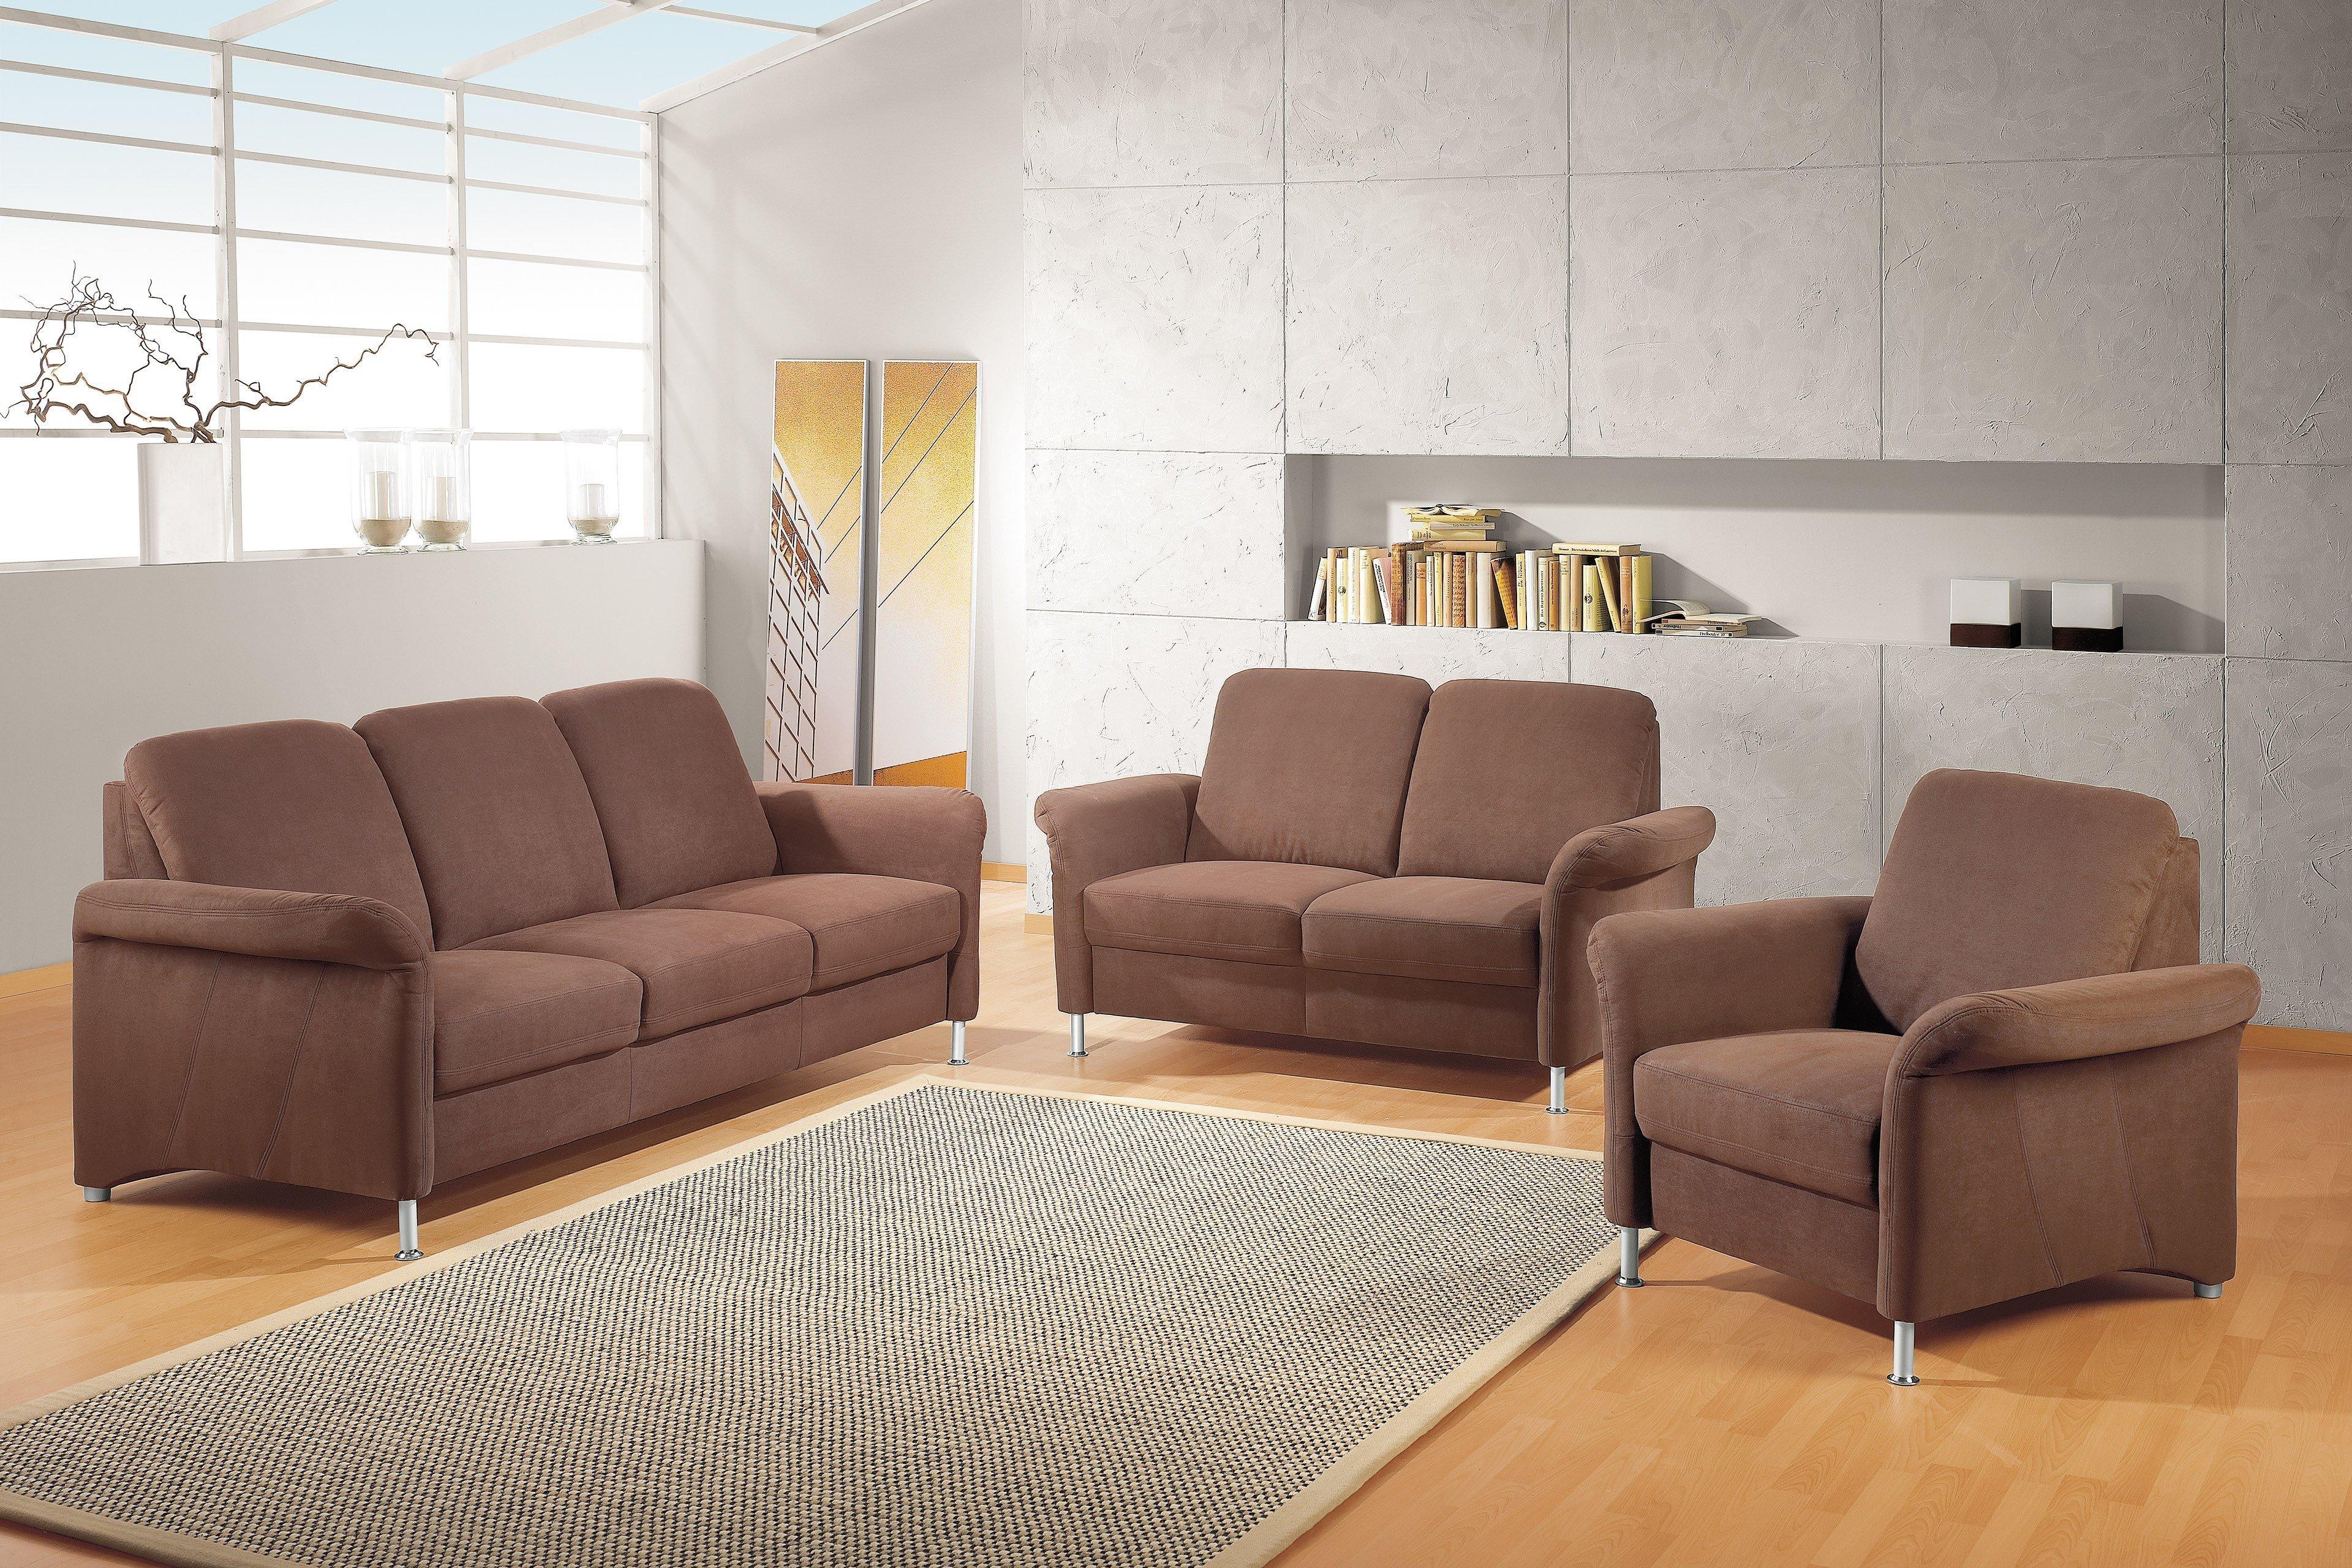 zehdenick jaguar 3 2 1 garnitur braun m bel letz ihr online shop. Black Bedroom Furniture Sets. Home Design Ideas